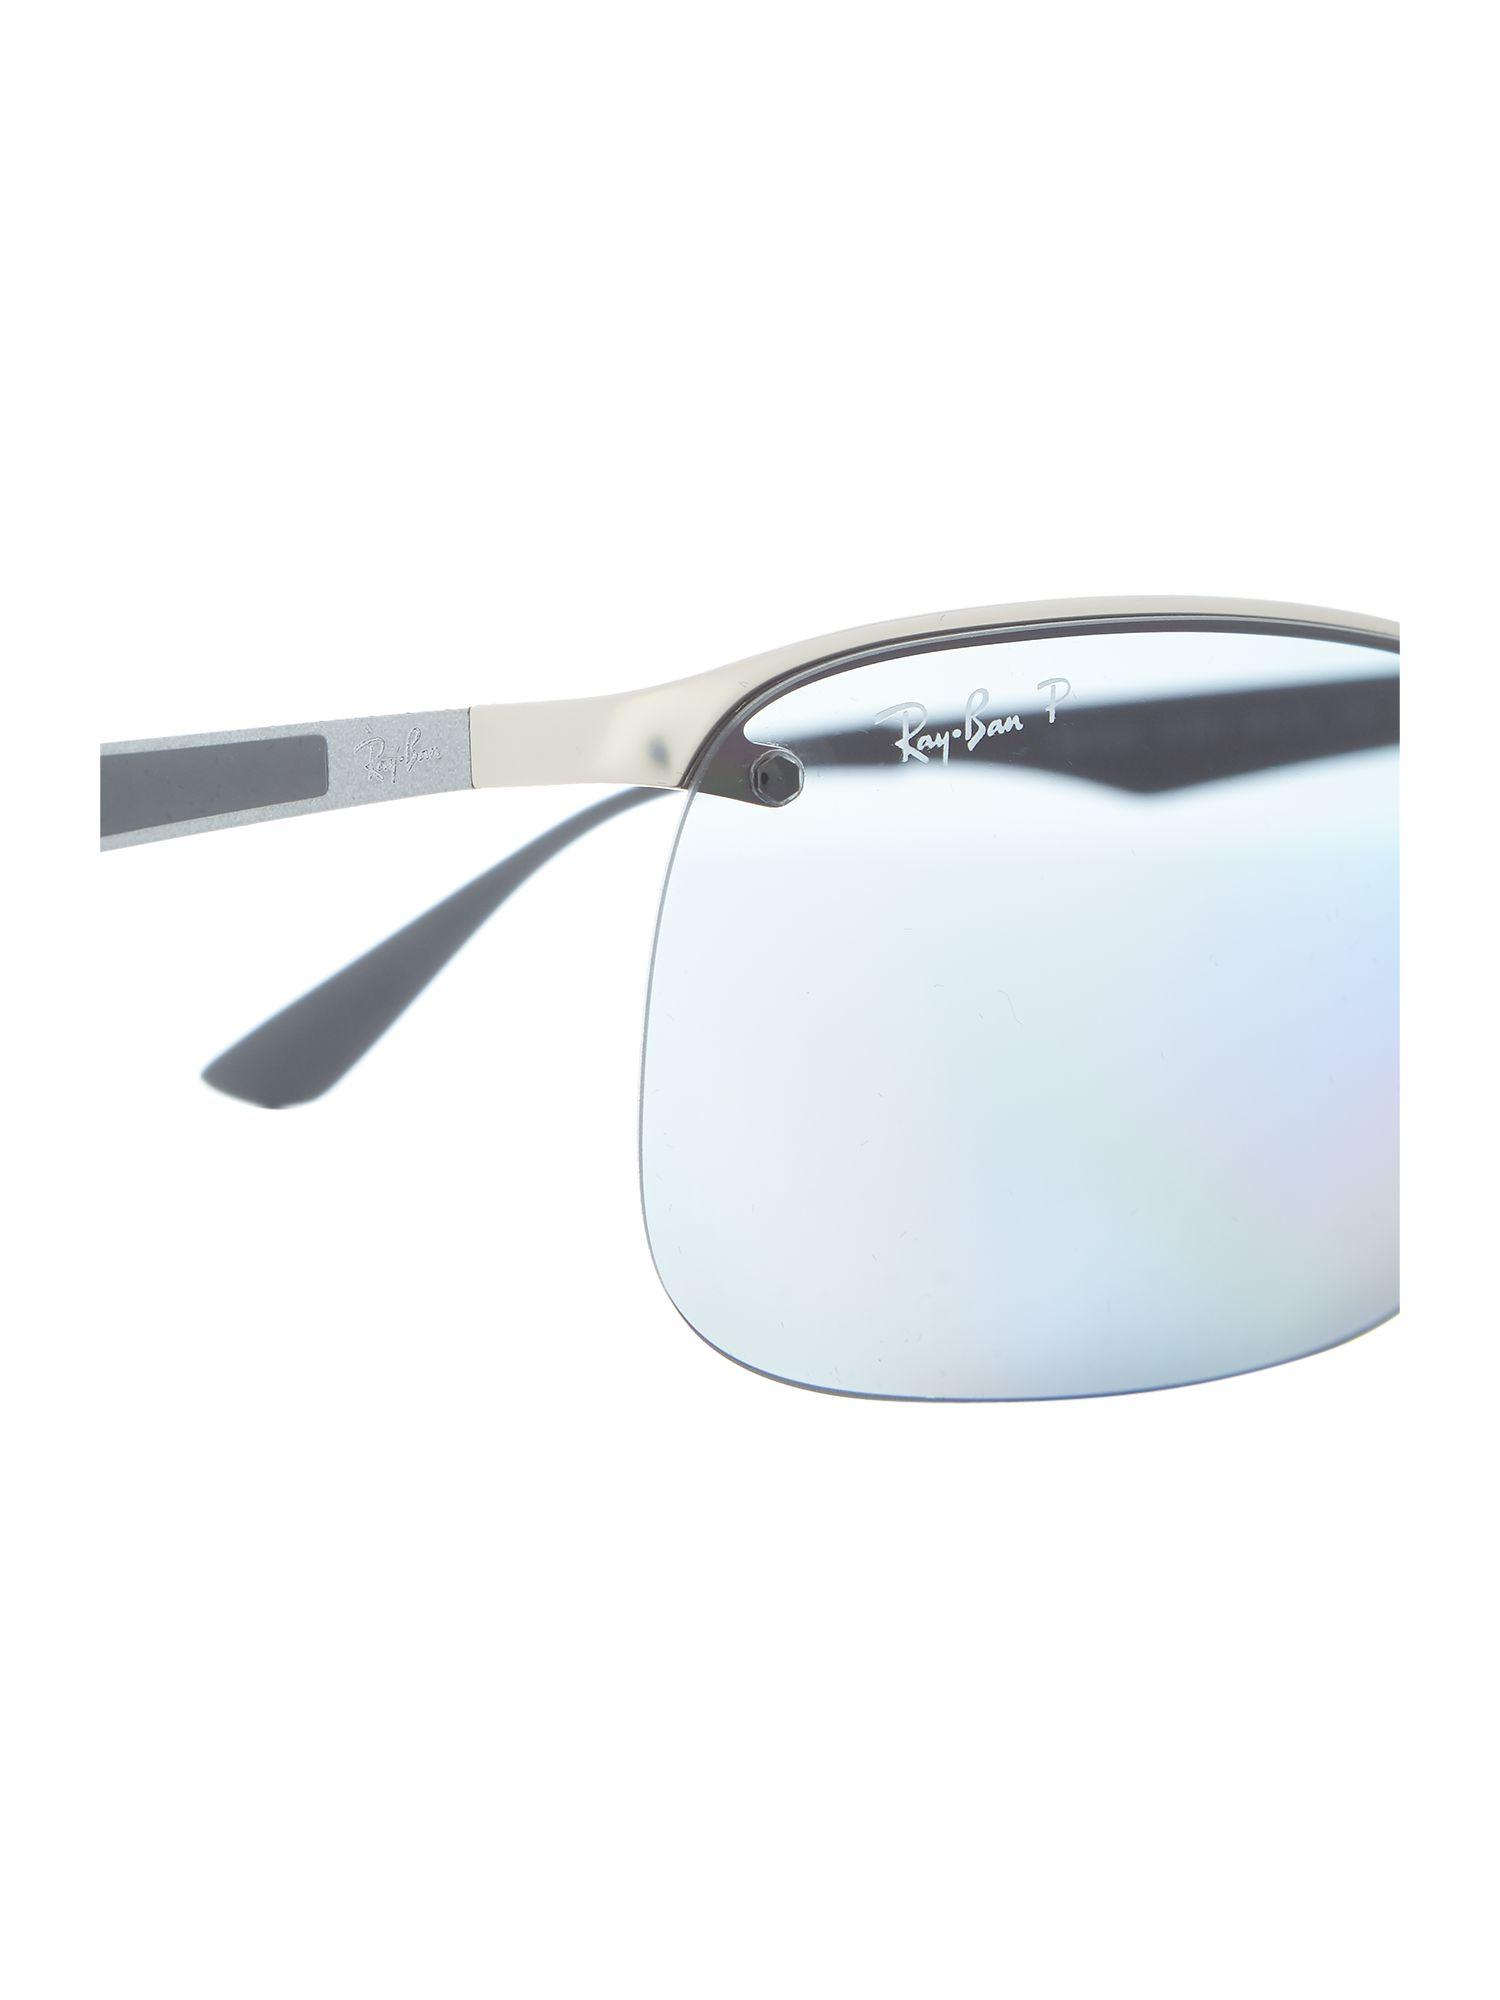 dc4ea698b1 Ray Ban Square Men Sunglasses « Heritage Malta